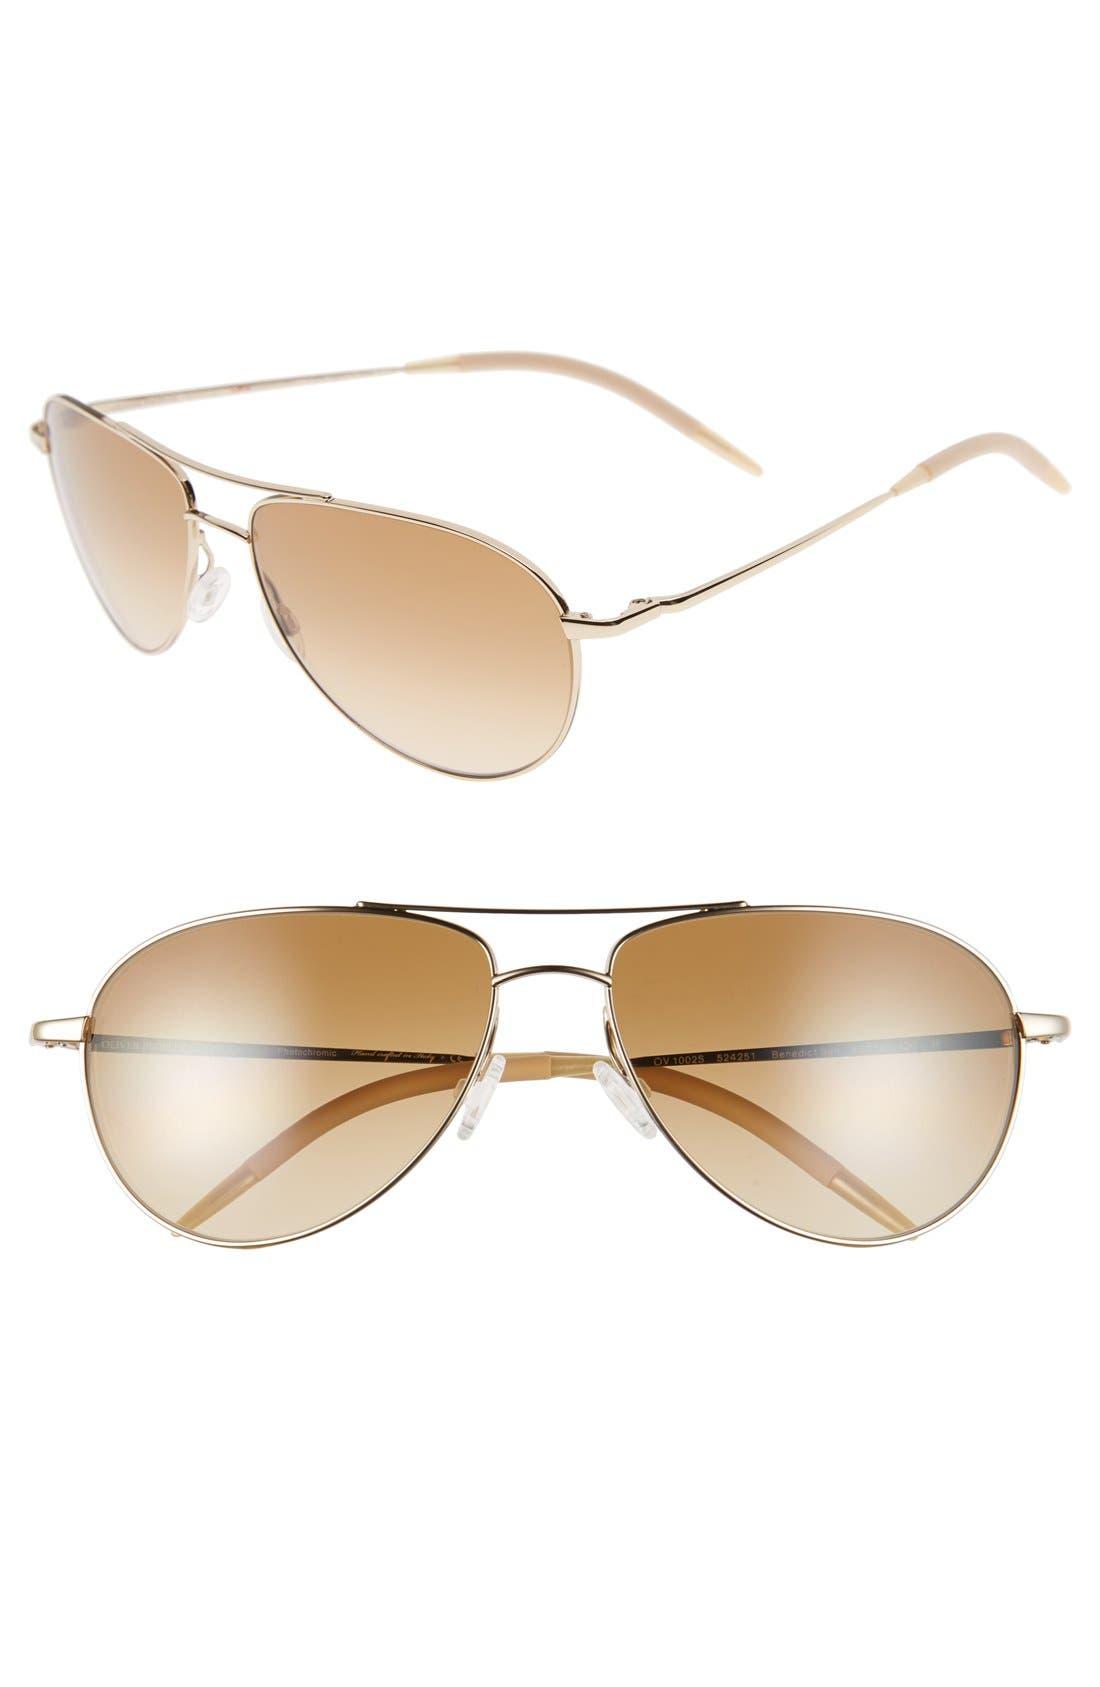 'Benedict' 59Mm Gradient Aviator Sunglasses - Gold/ Chrome Amber in Gold Frames/Yellow Lenses